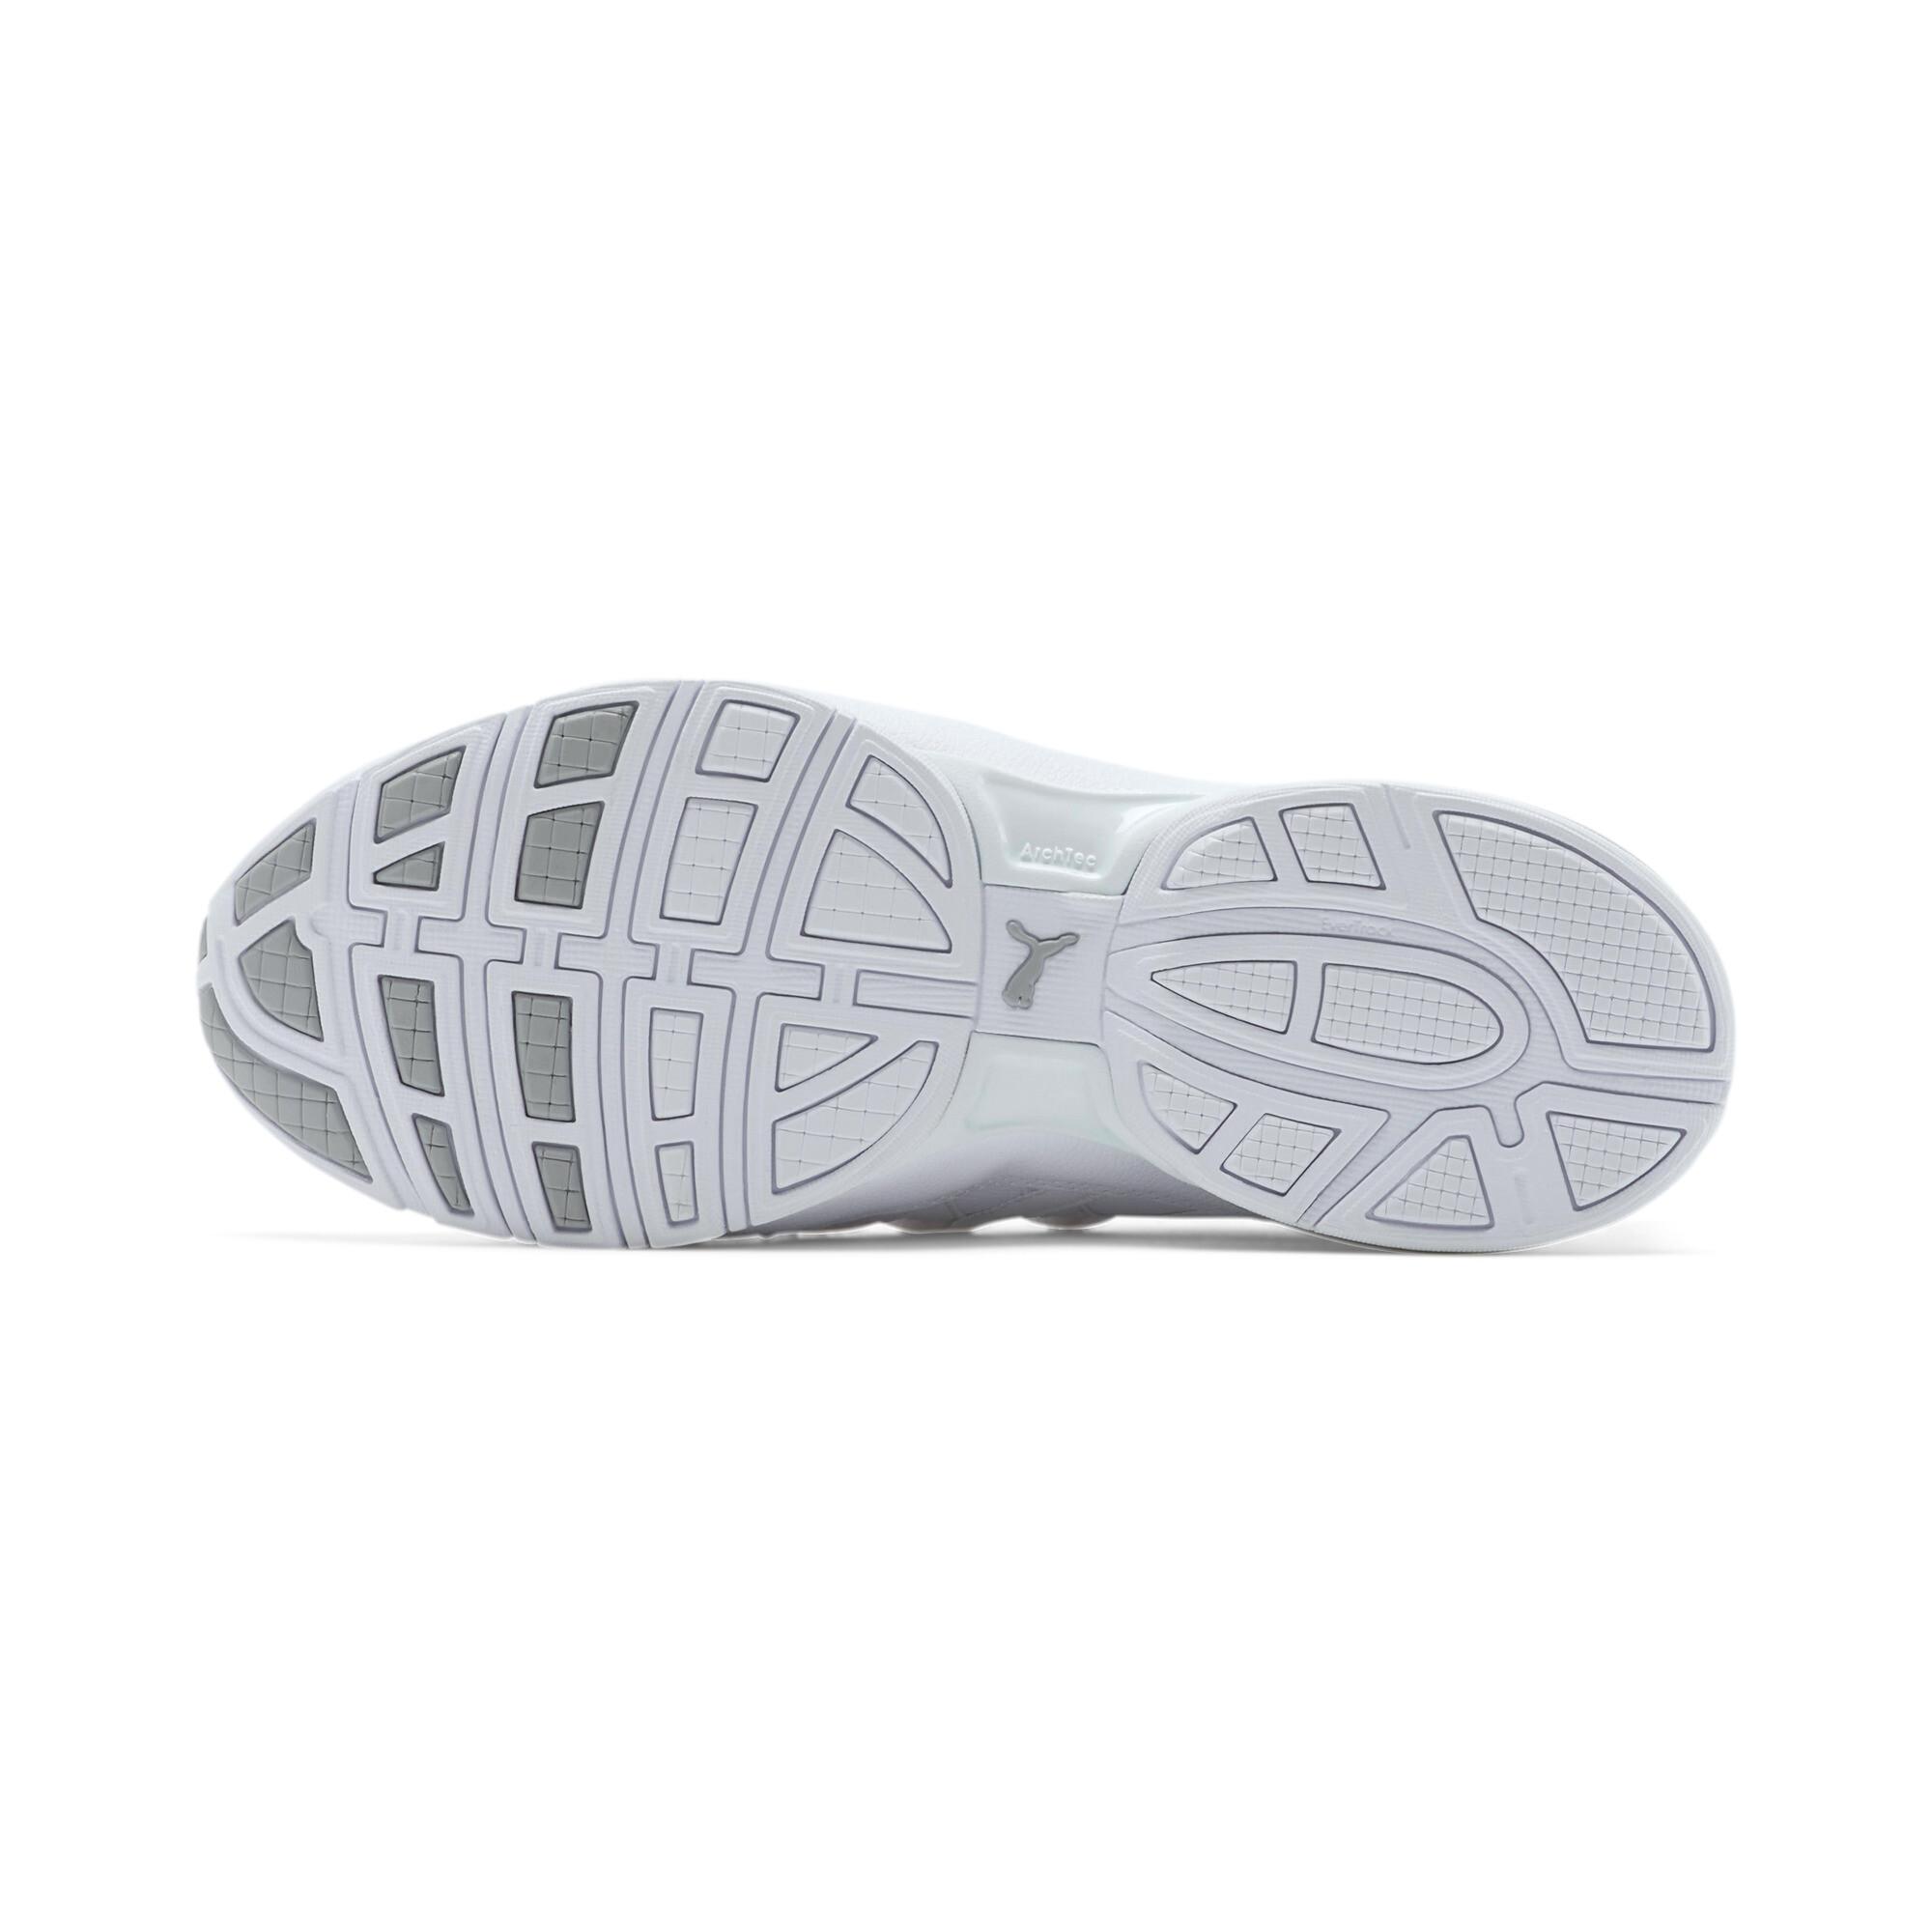 PUMA-Women-039-s-Riaze-Prowl-Wide-Sneakers thumbnail 5